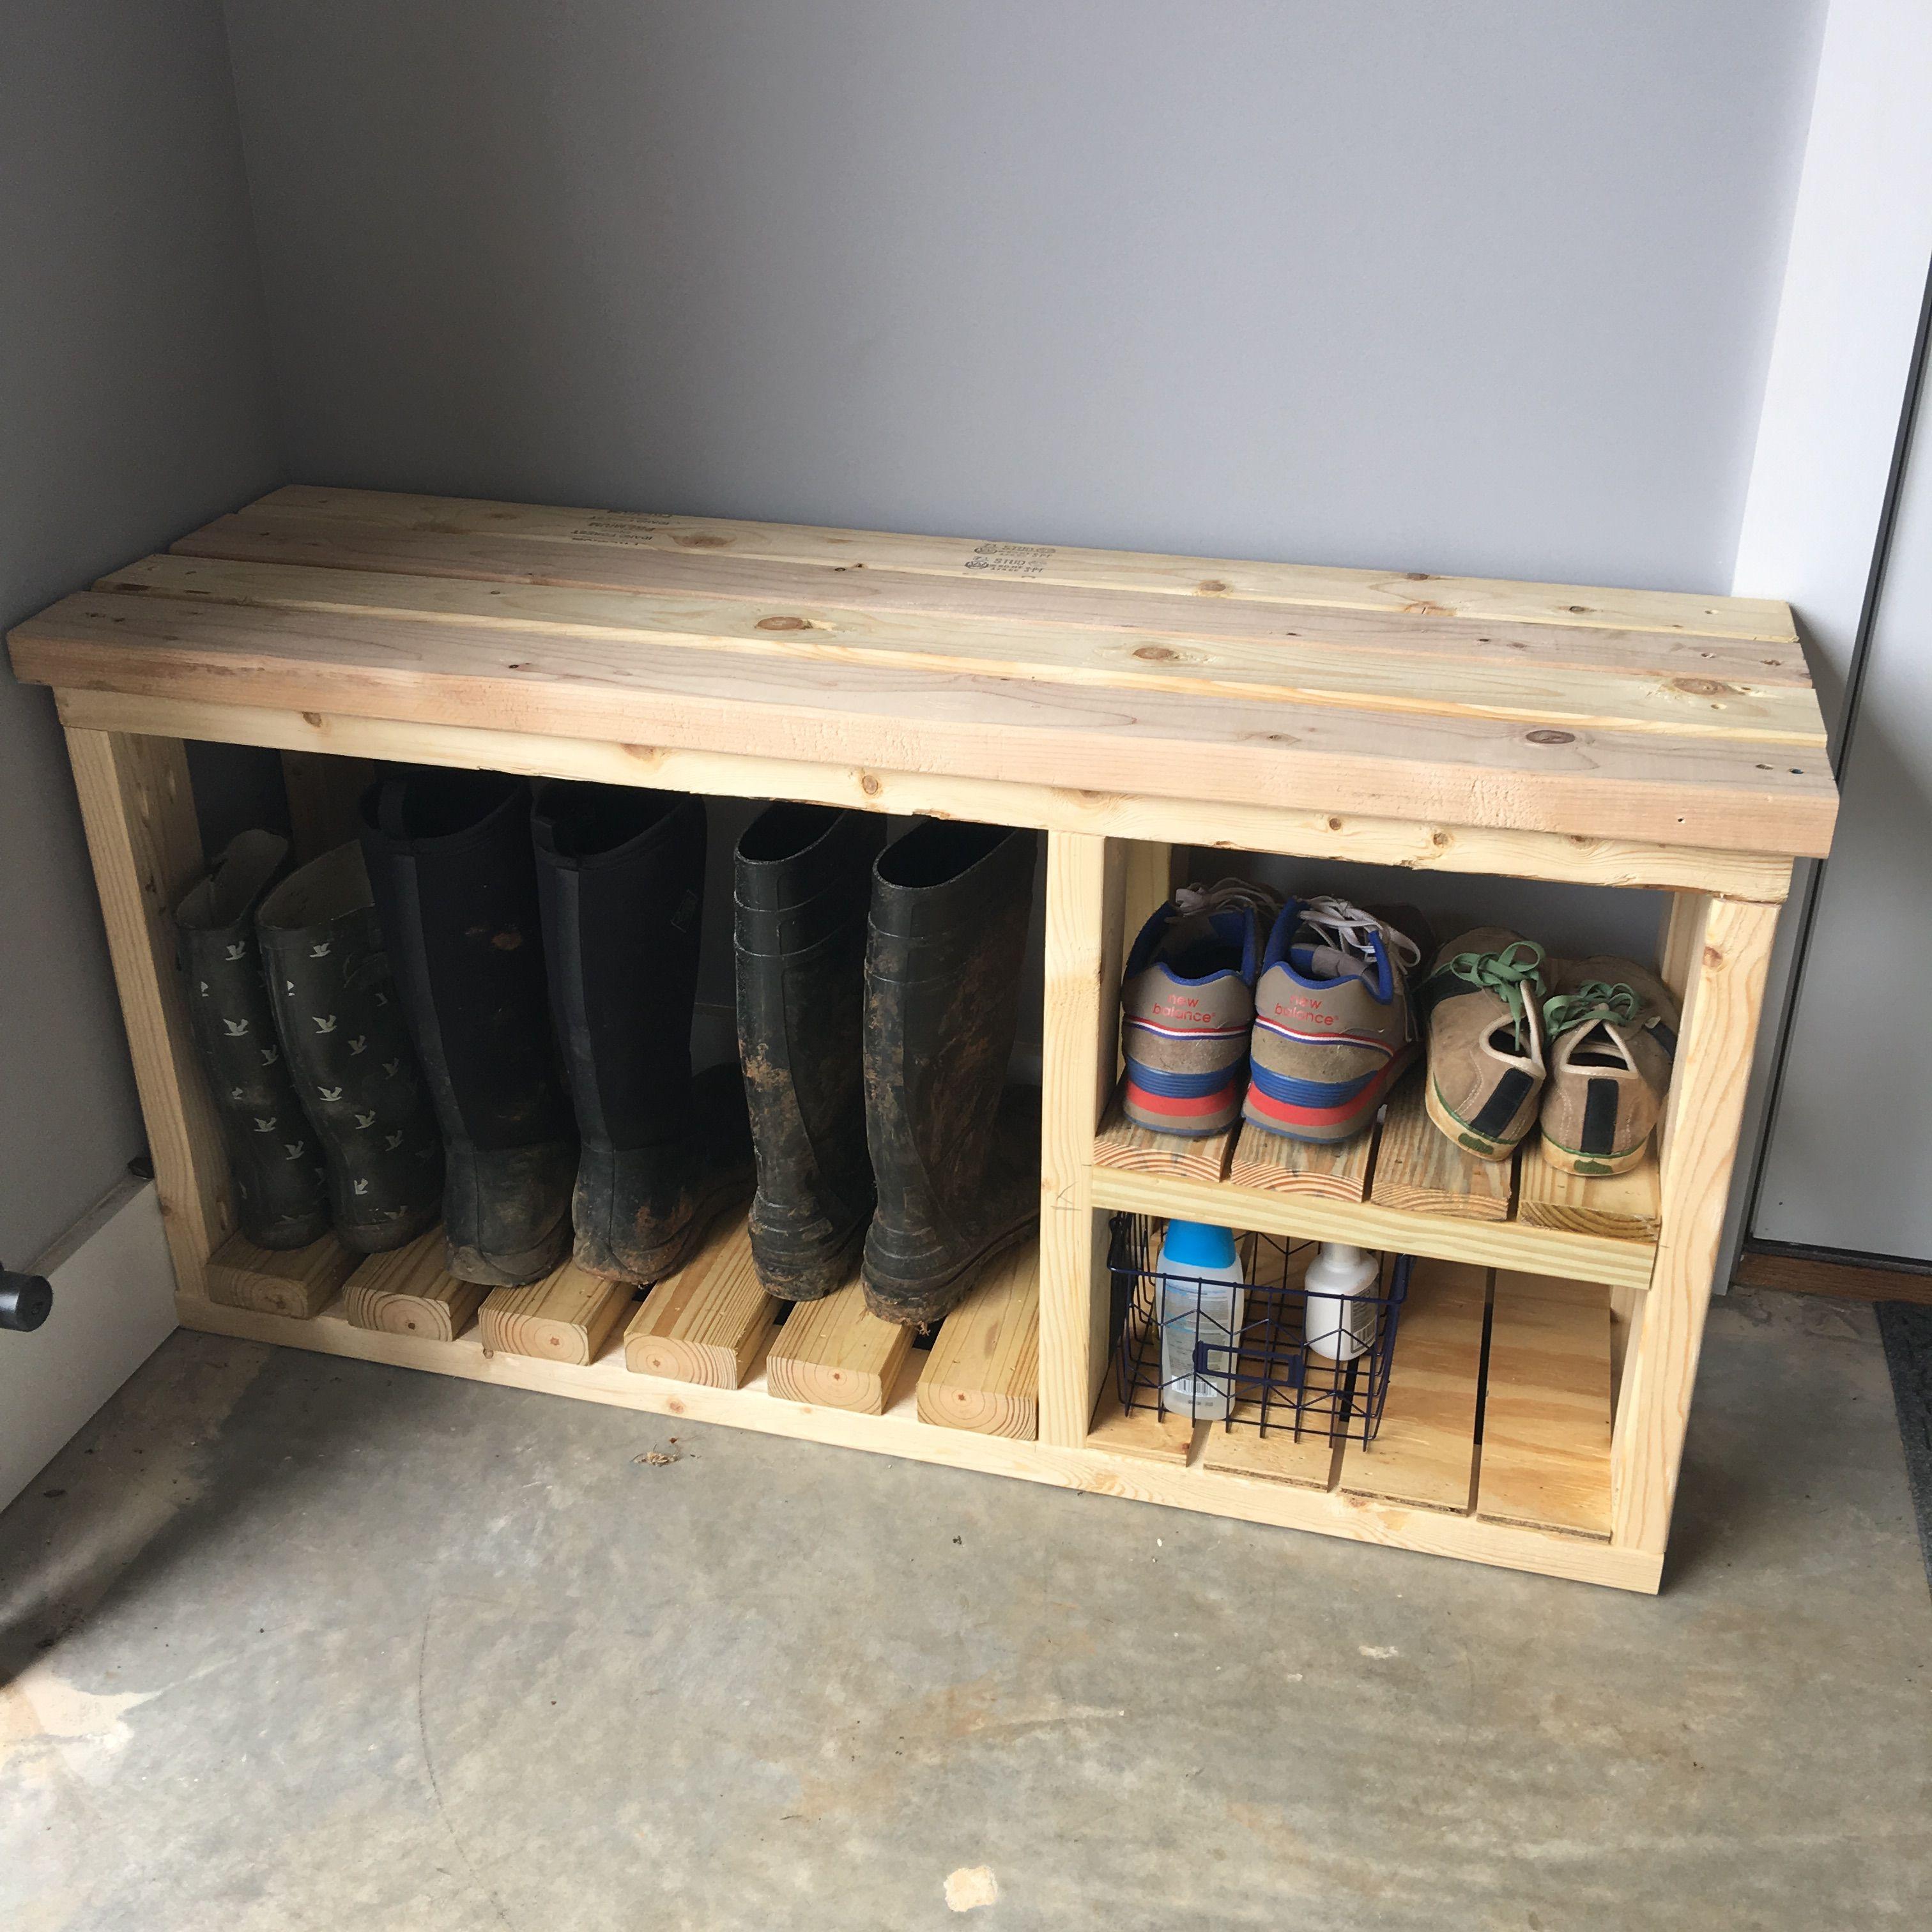 Pin By Danielle Stiglitz On Build It Wooden Shoe Racks Diy Shoe Storage Pallet Diy